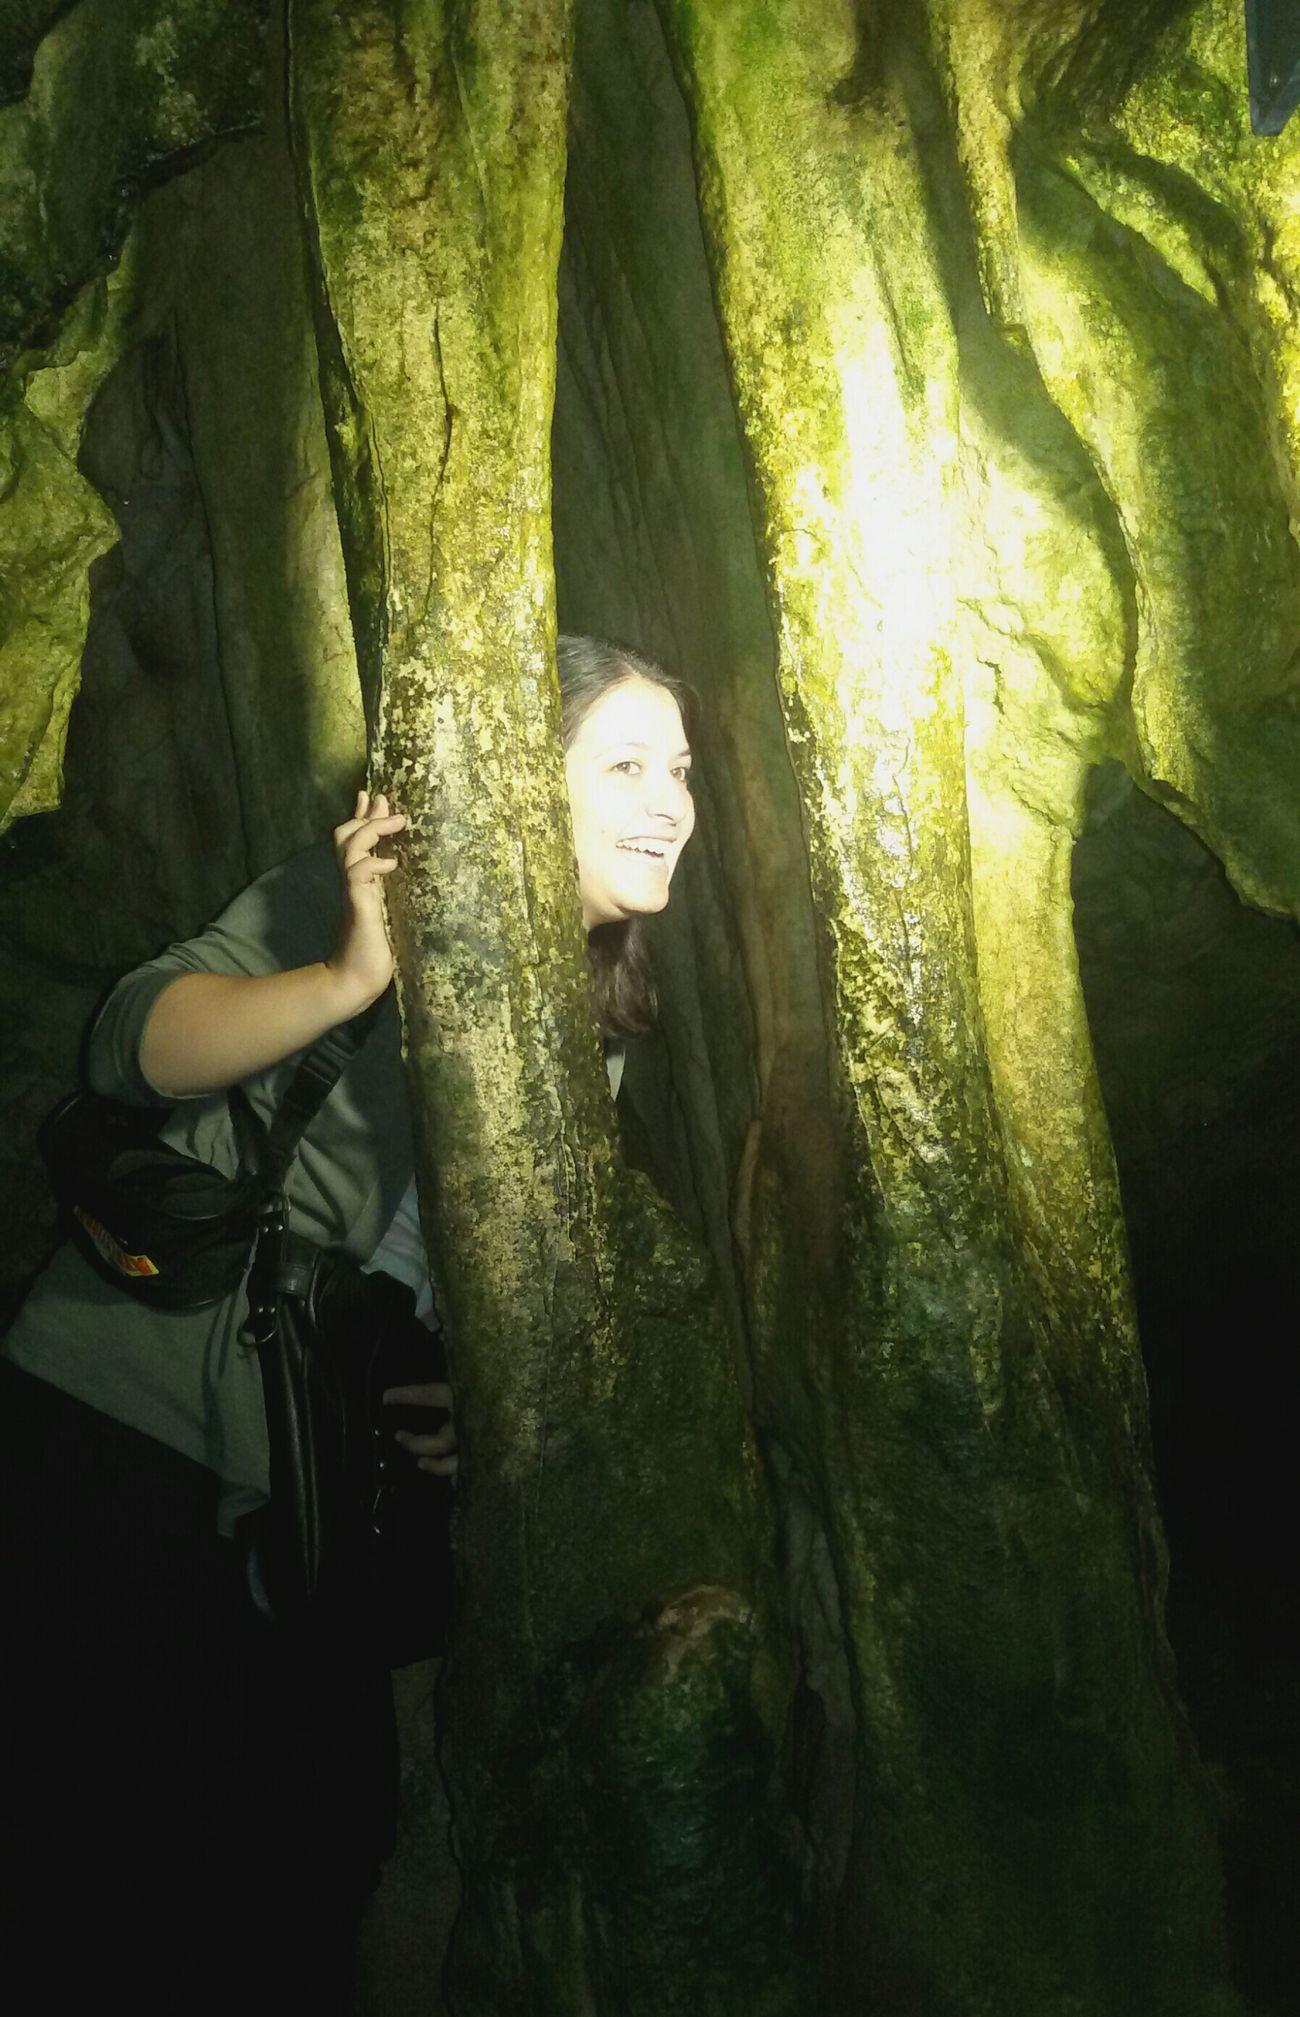 Burdur İnsuyu CavePeople And Places Person Nature Burdur Insuyu Cave Smile Stalagmite Turkey First Eyeem Photo